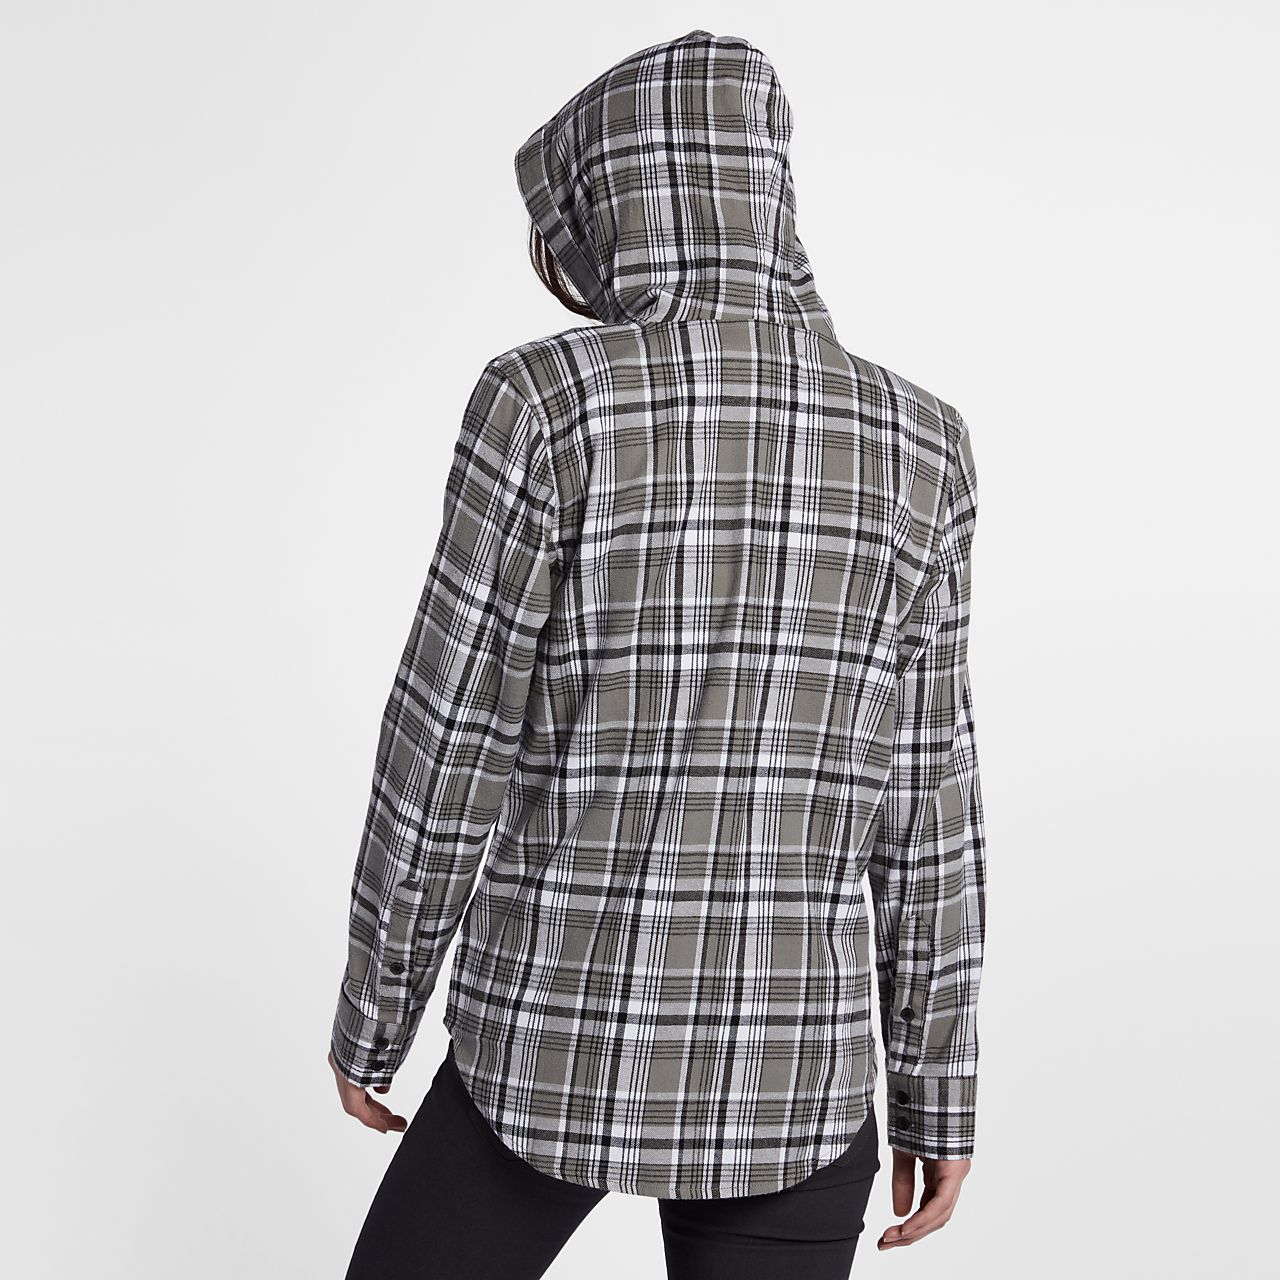 nike windbreaker jacket womens black and white plaid shirt